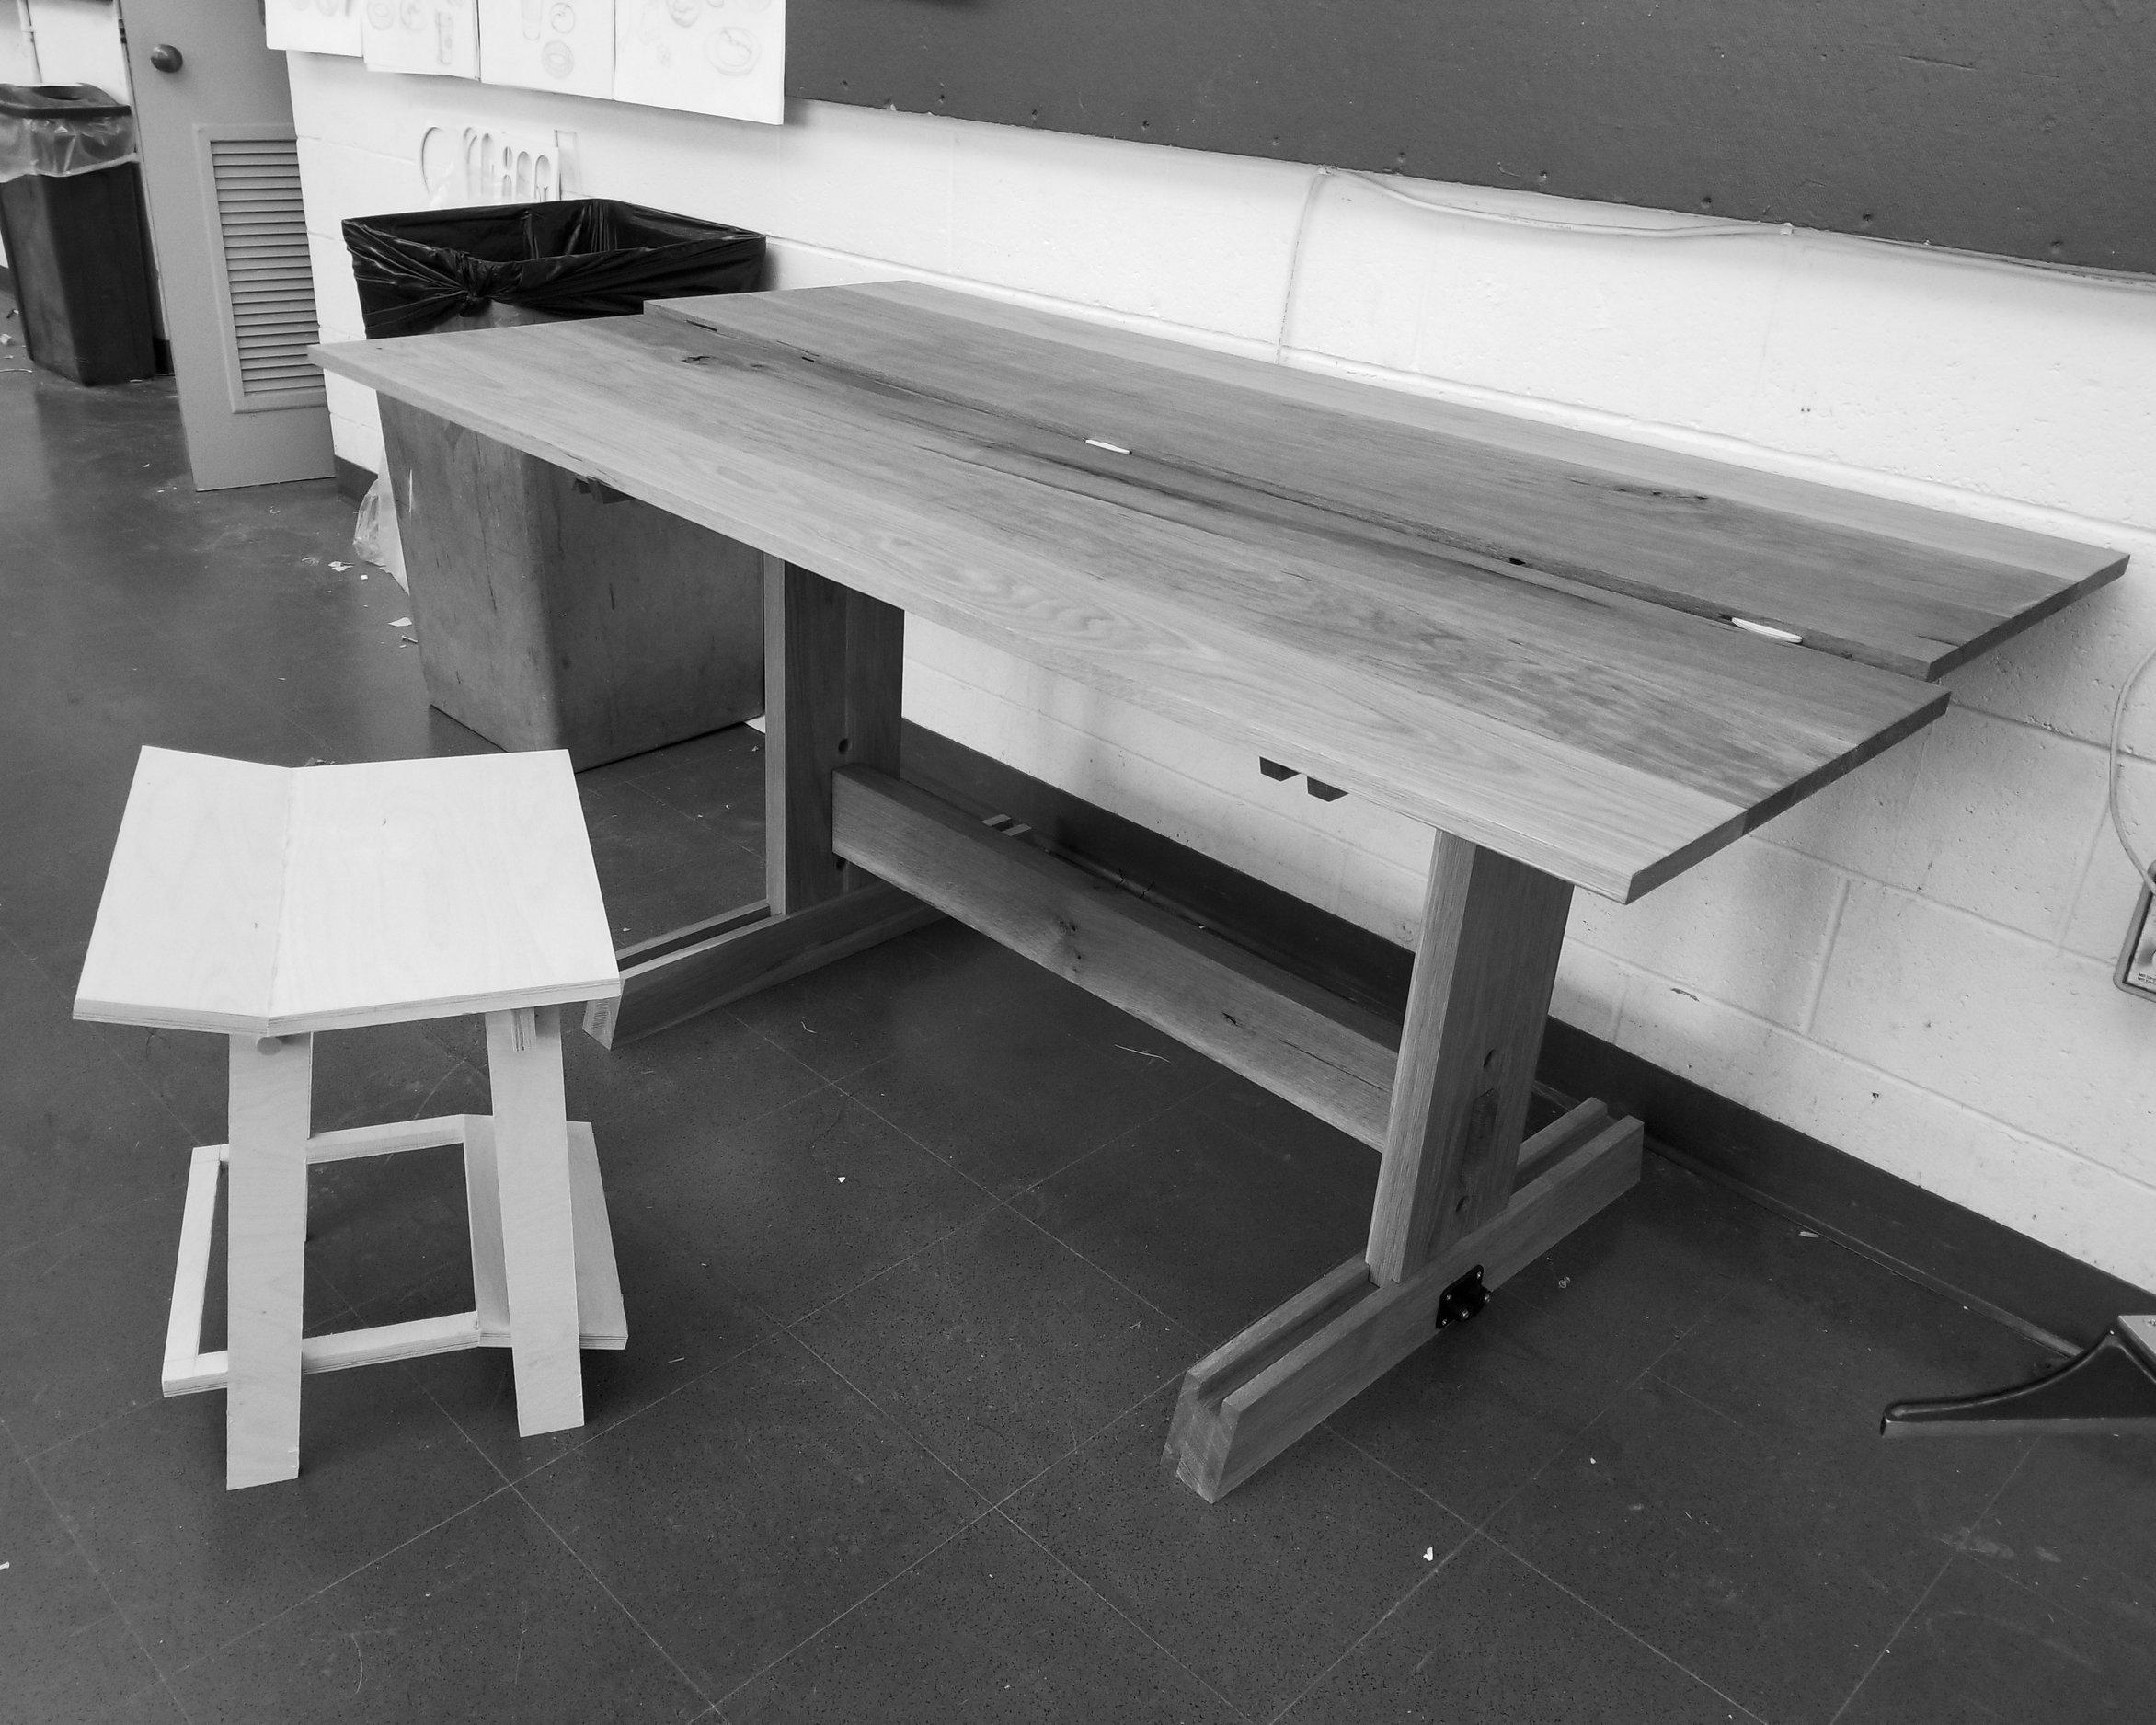 stoolprocess-1.jpg